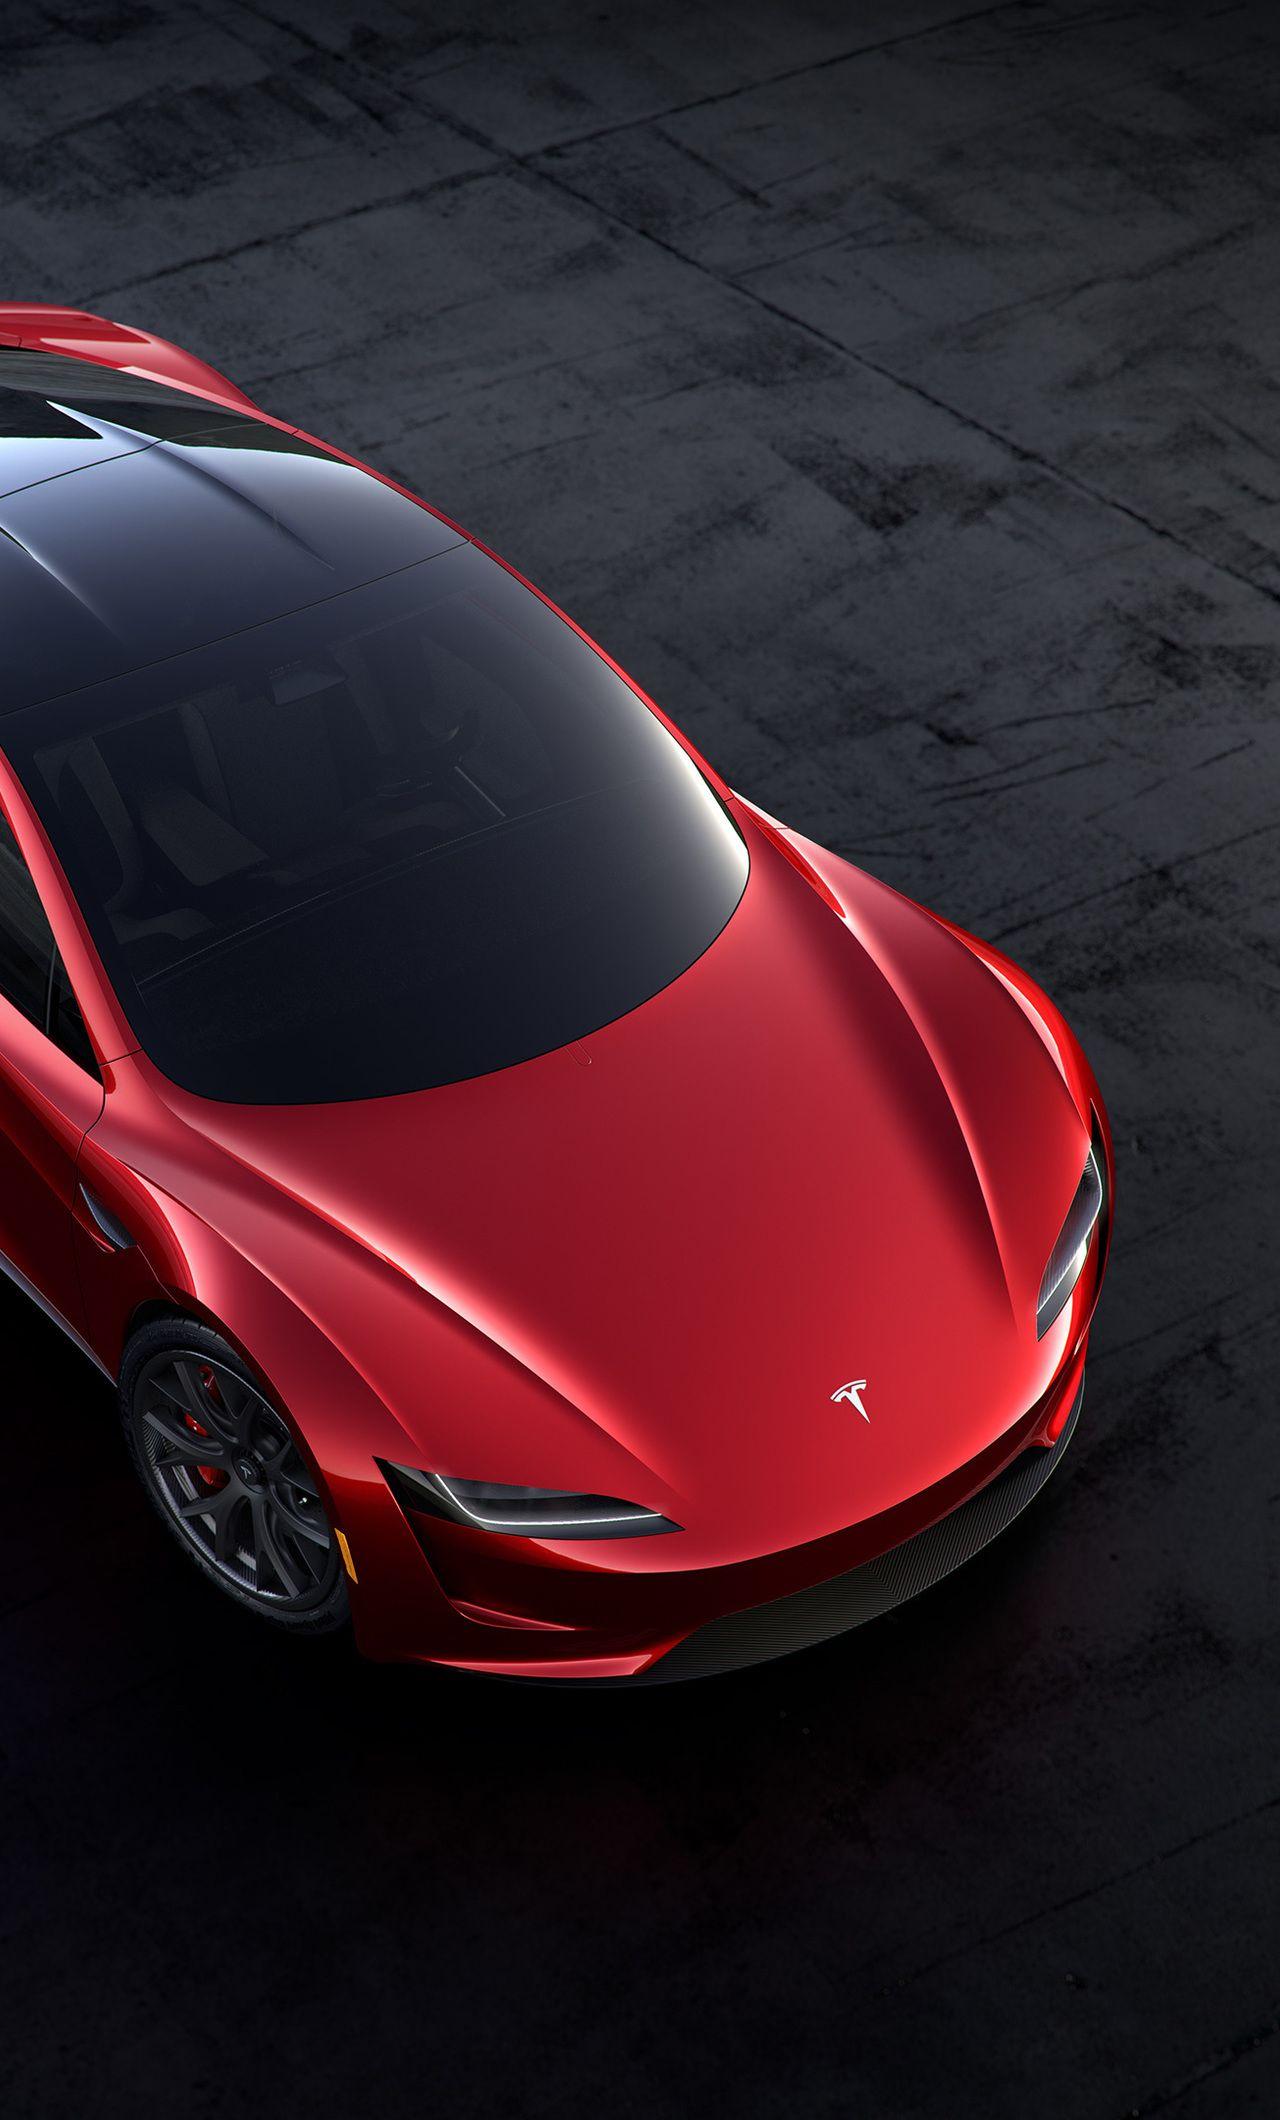 Tesla Roadster Wallpaper Mobile YME · Cars Desktop HD